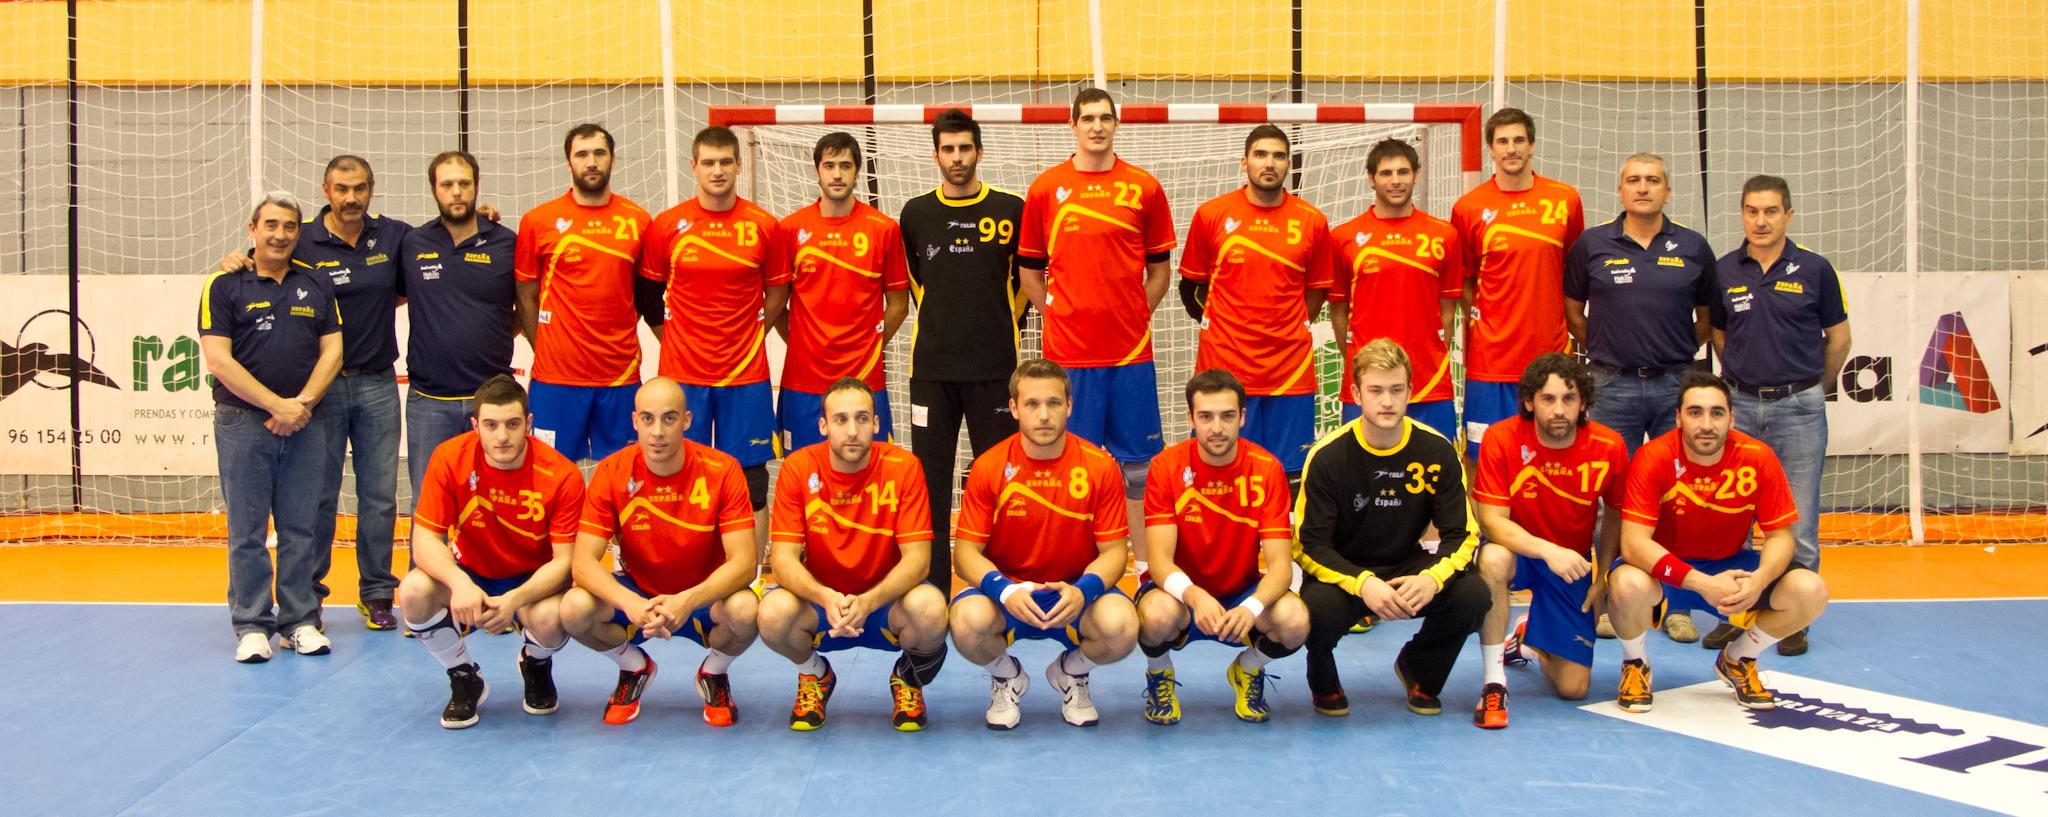 Handballshop.com, the biggest online handball shop.